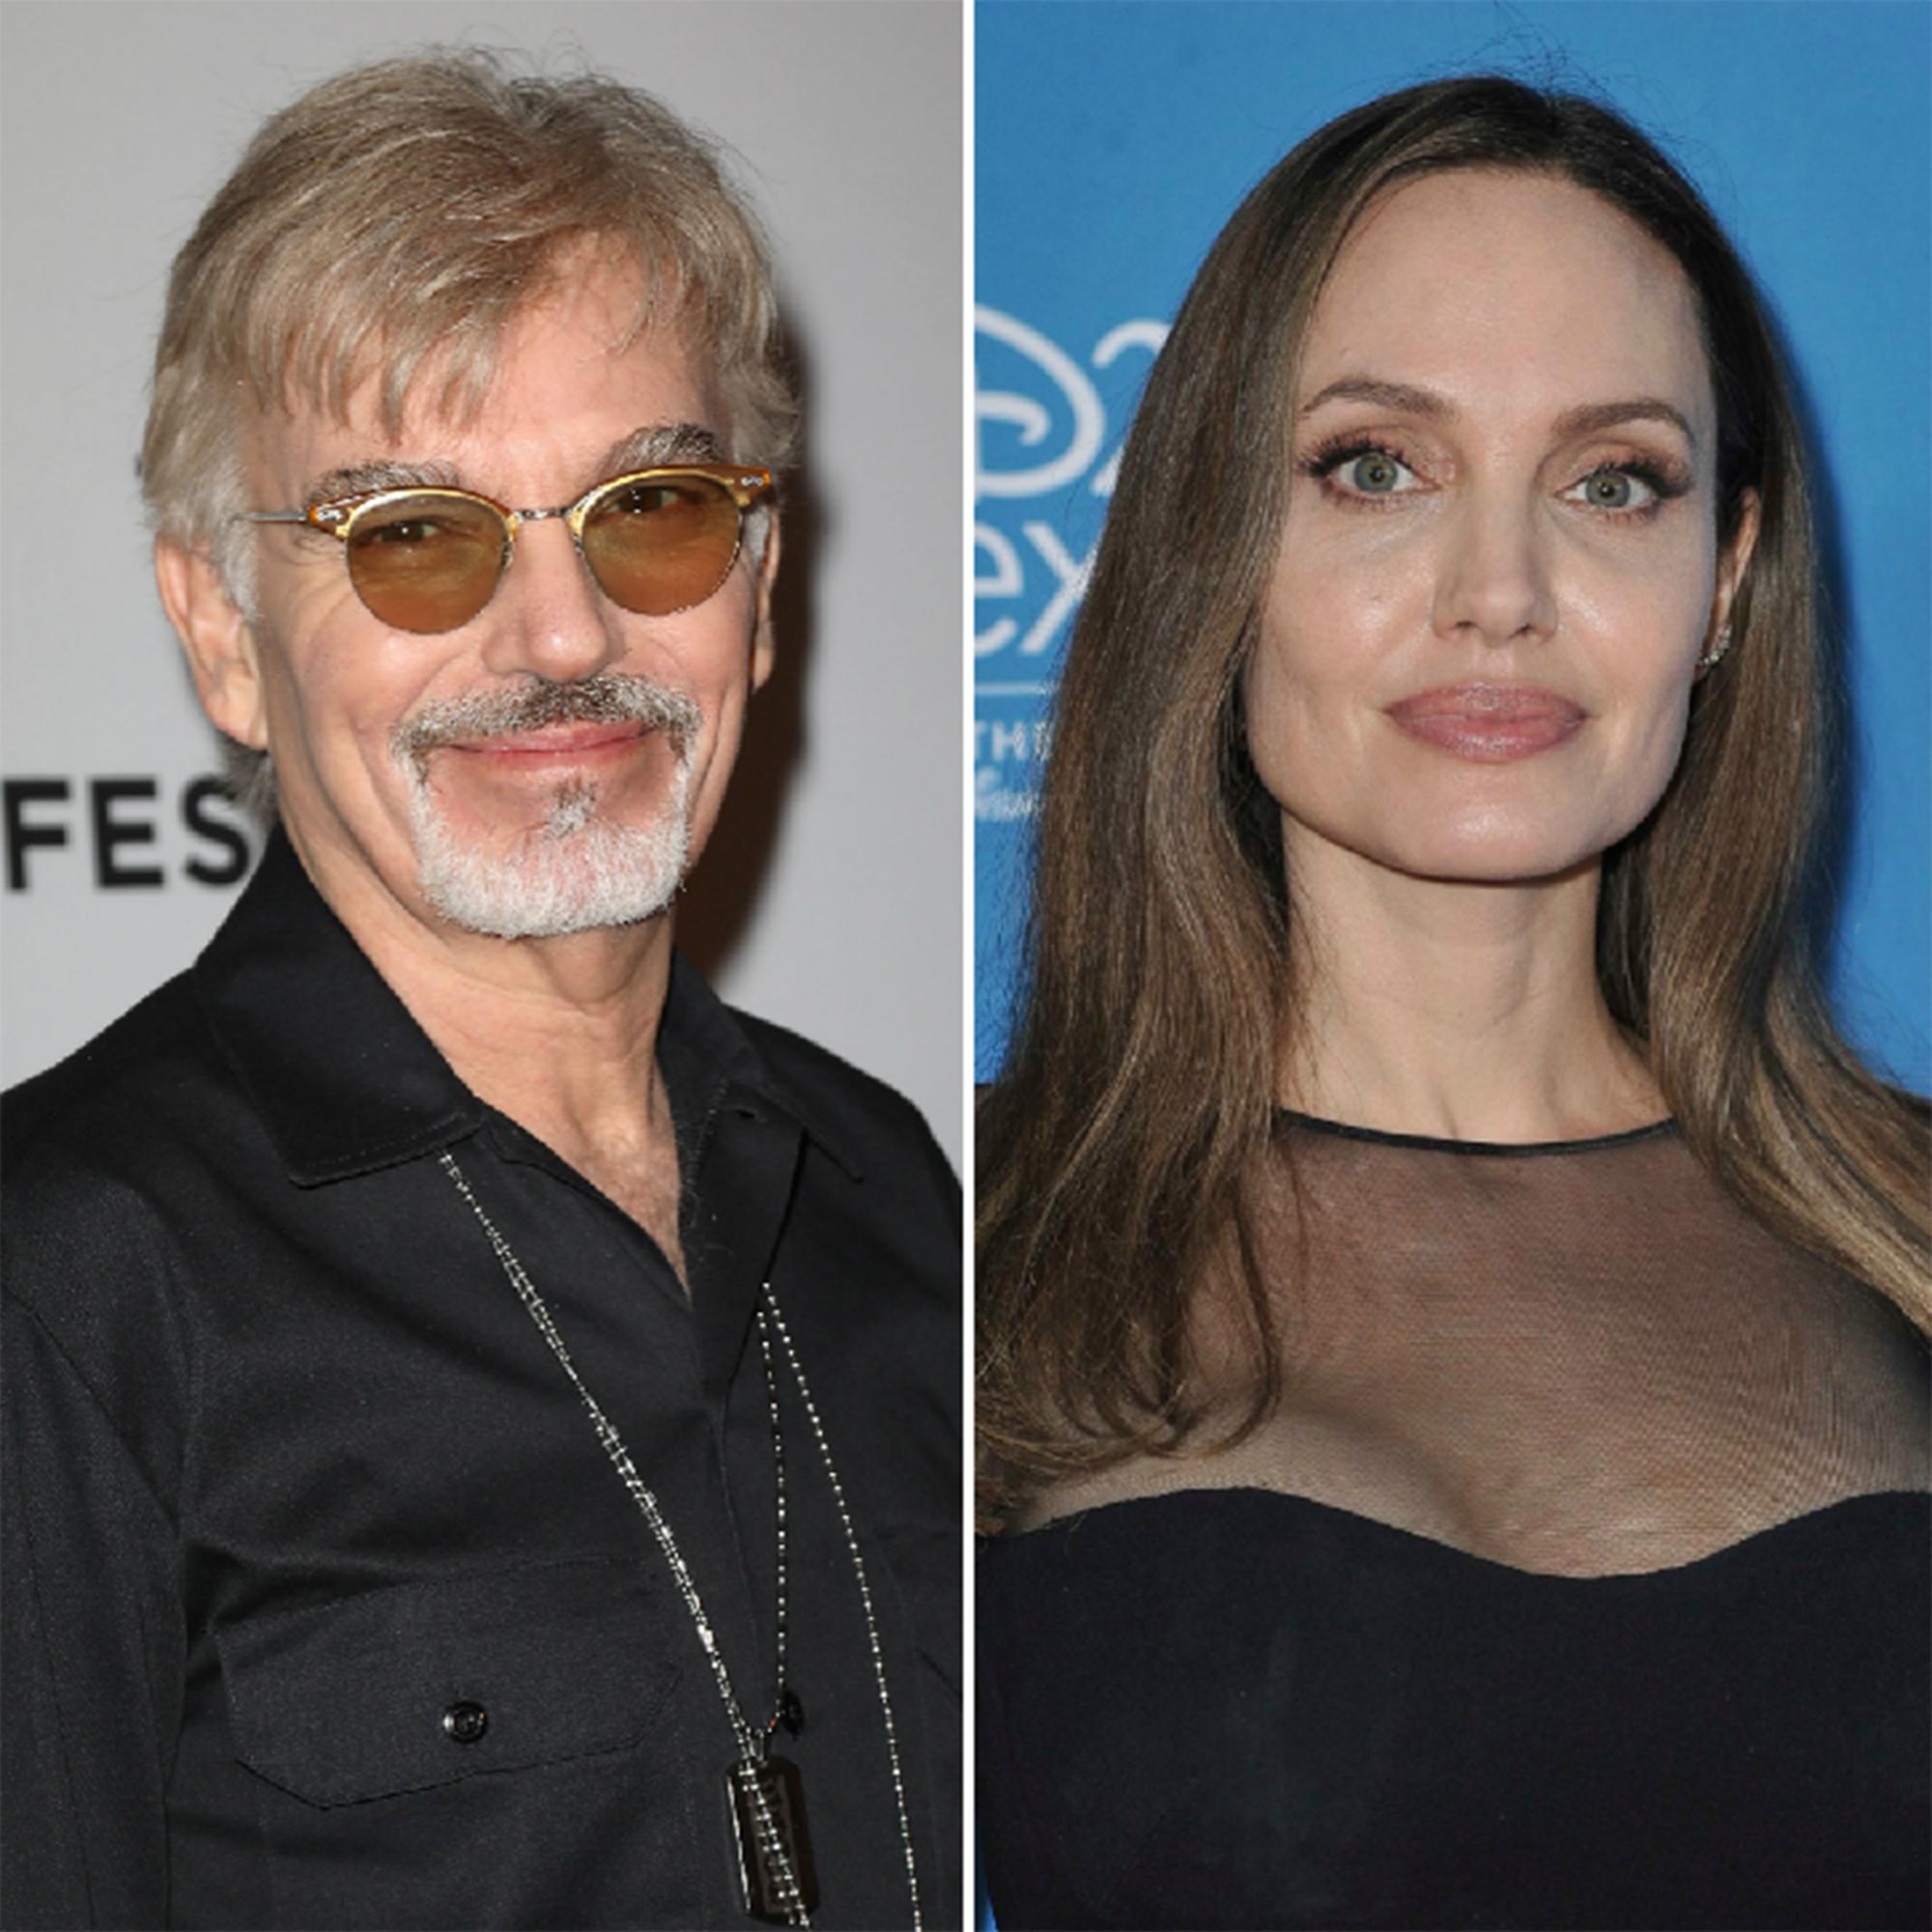 Billy Bob Thornton And Angelina Jolie Are Still Friends